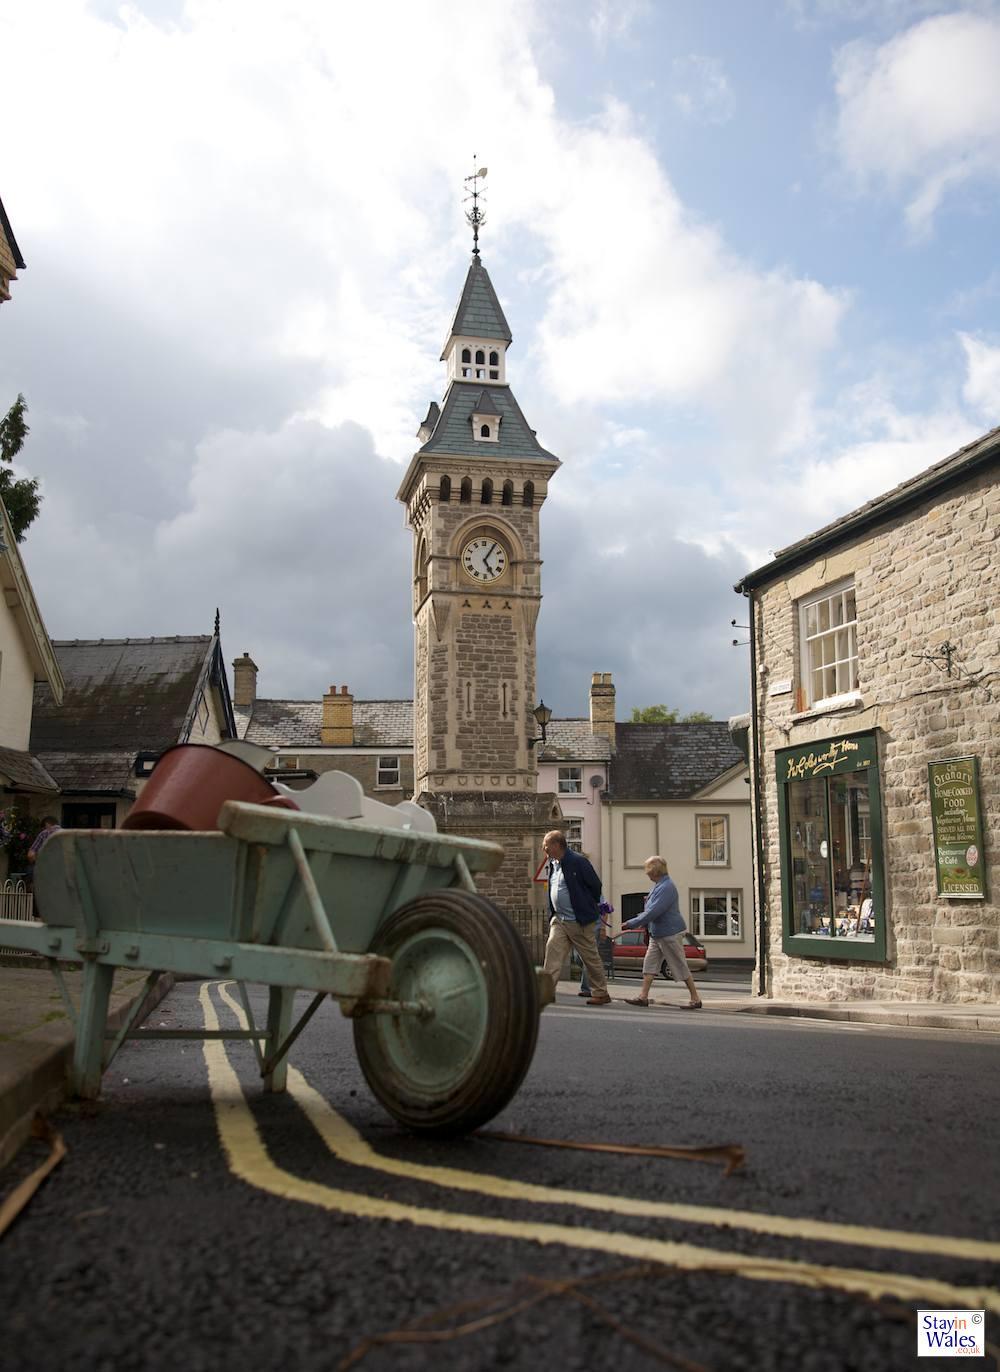 Lion Street and the Clocktower, Hay-on-Wye